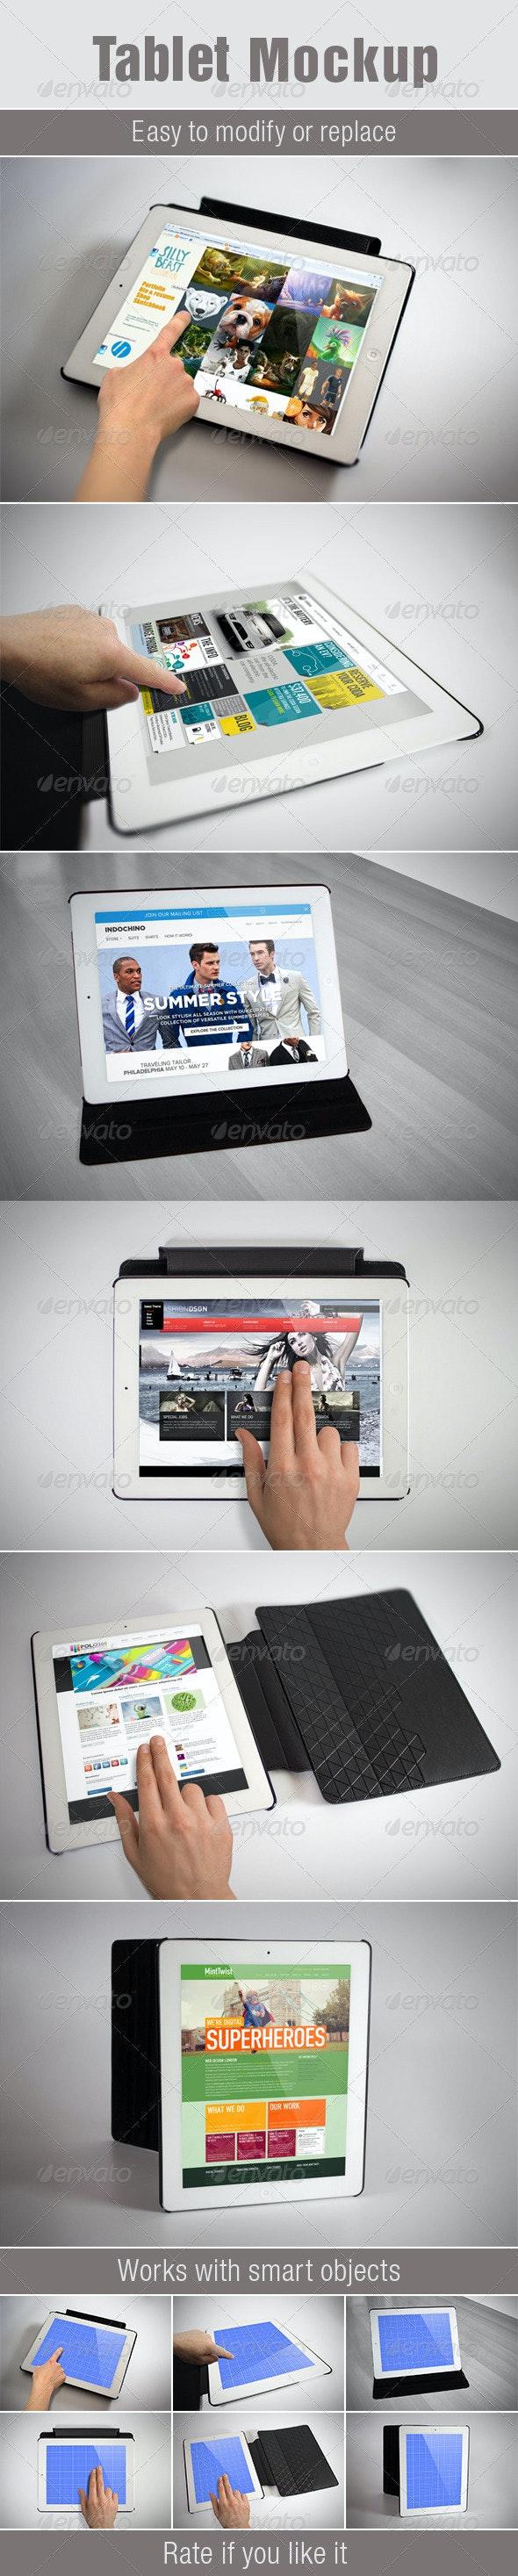 Tablet Mockup - Product Mock-Ups Graphics